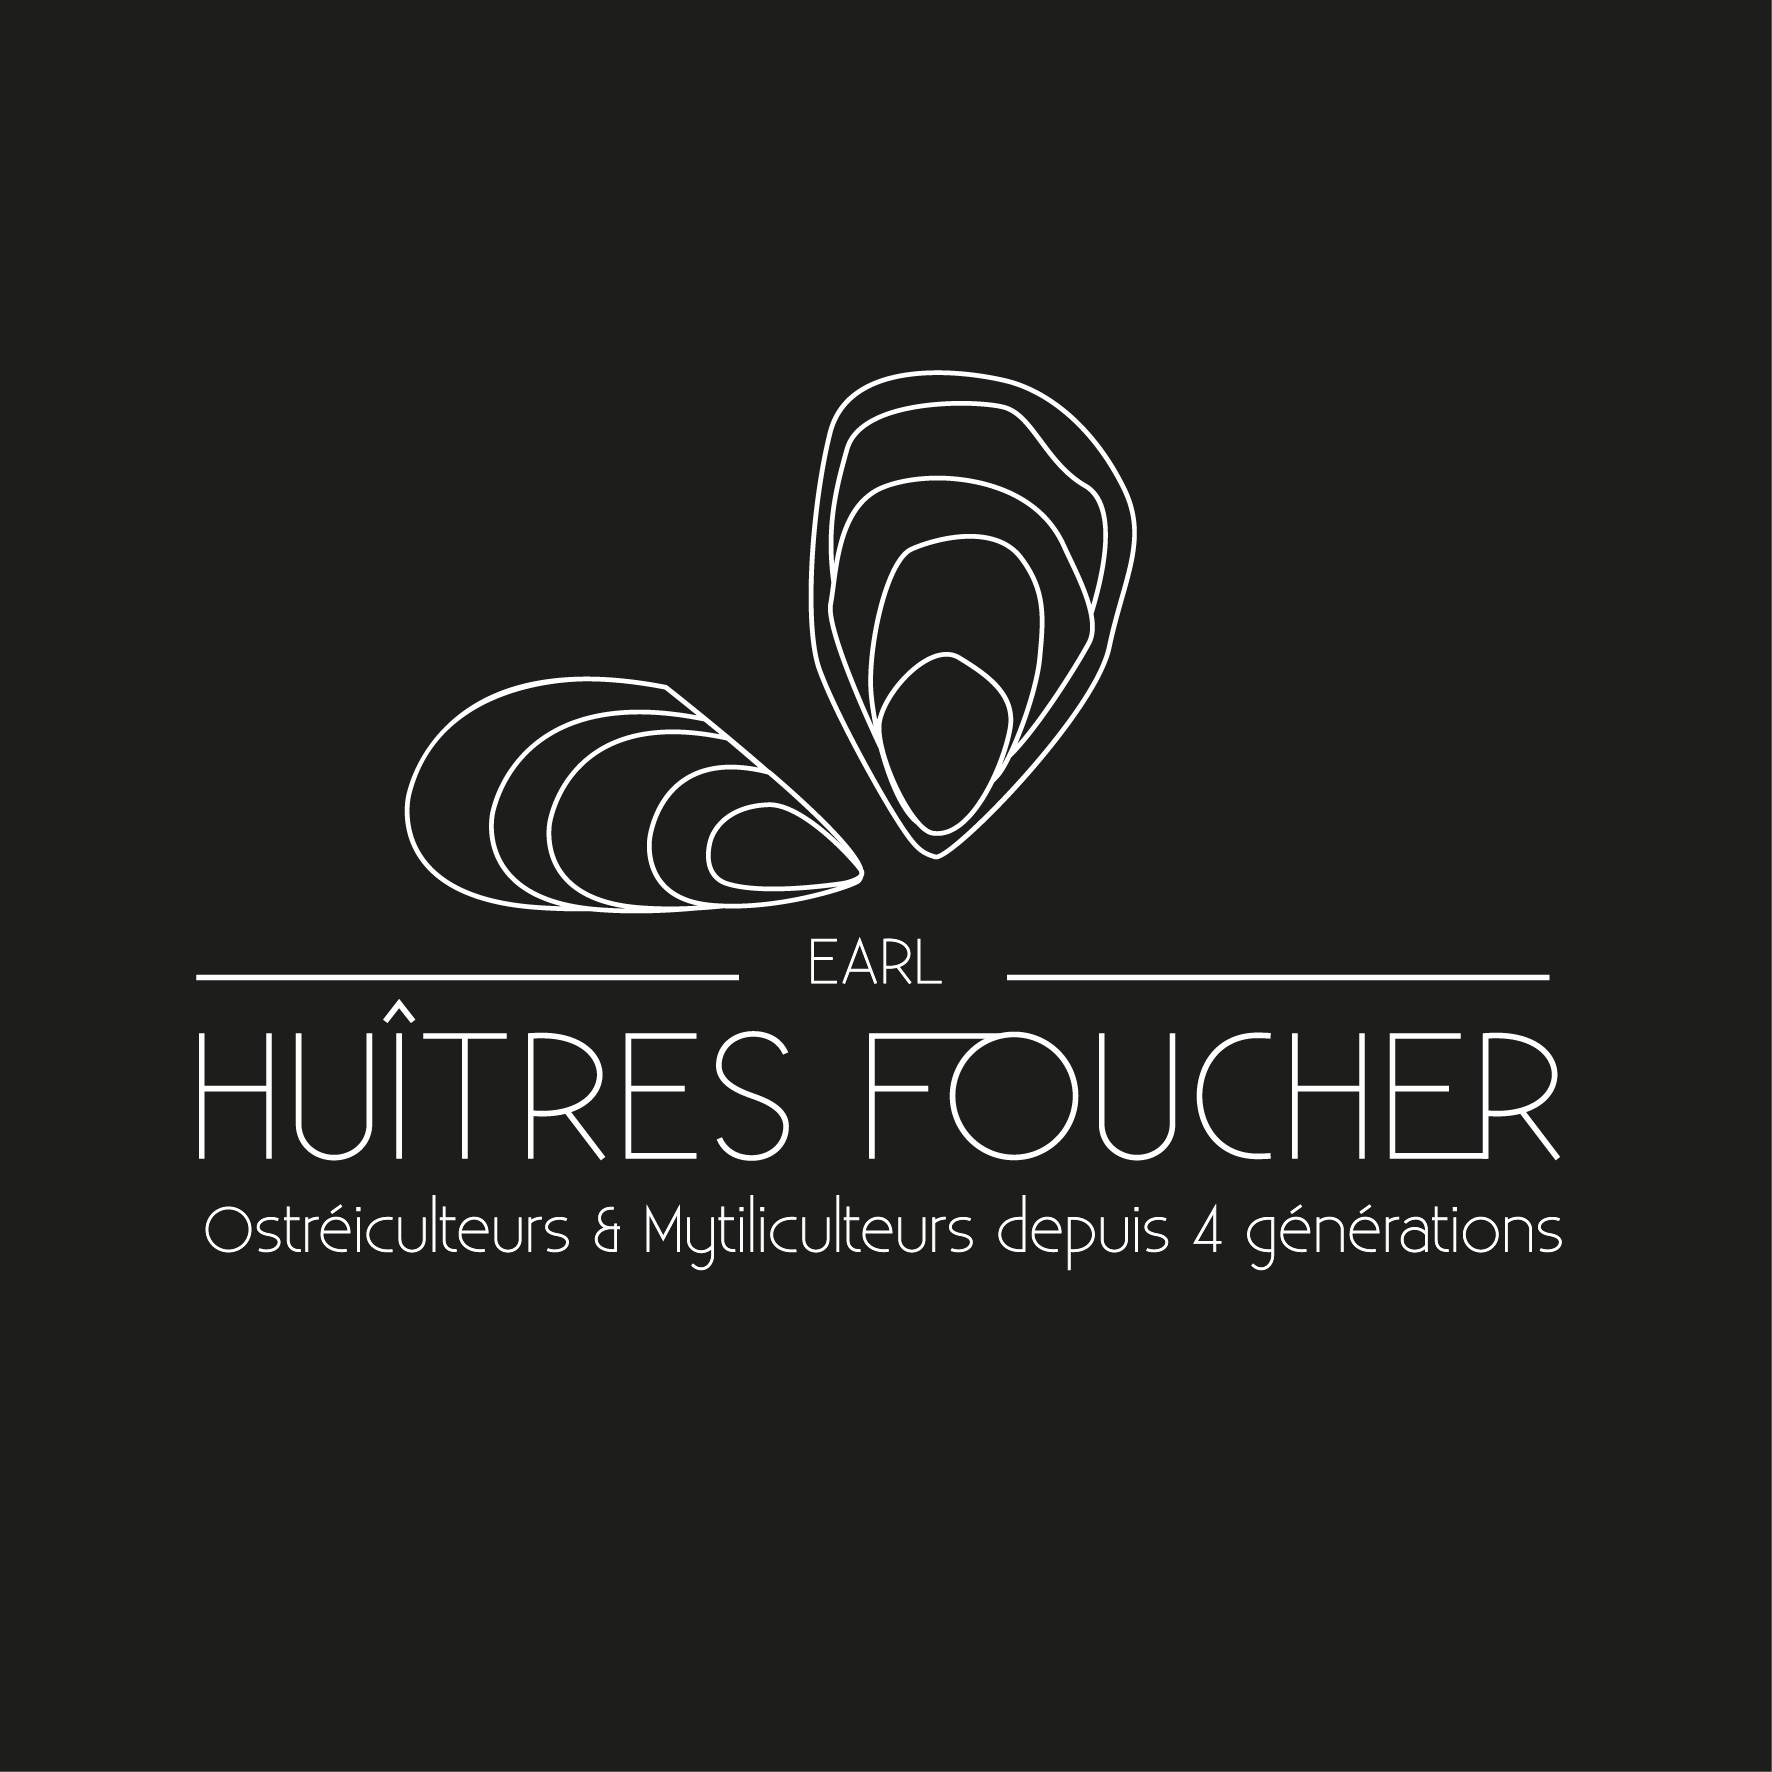 Le logo Foucher